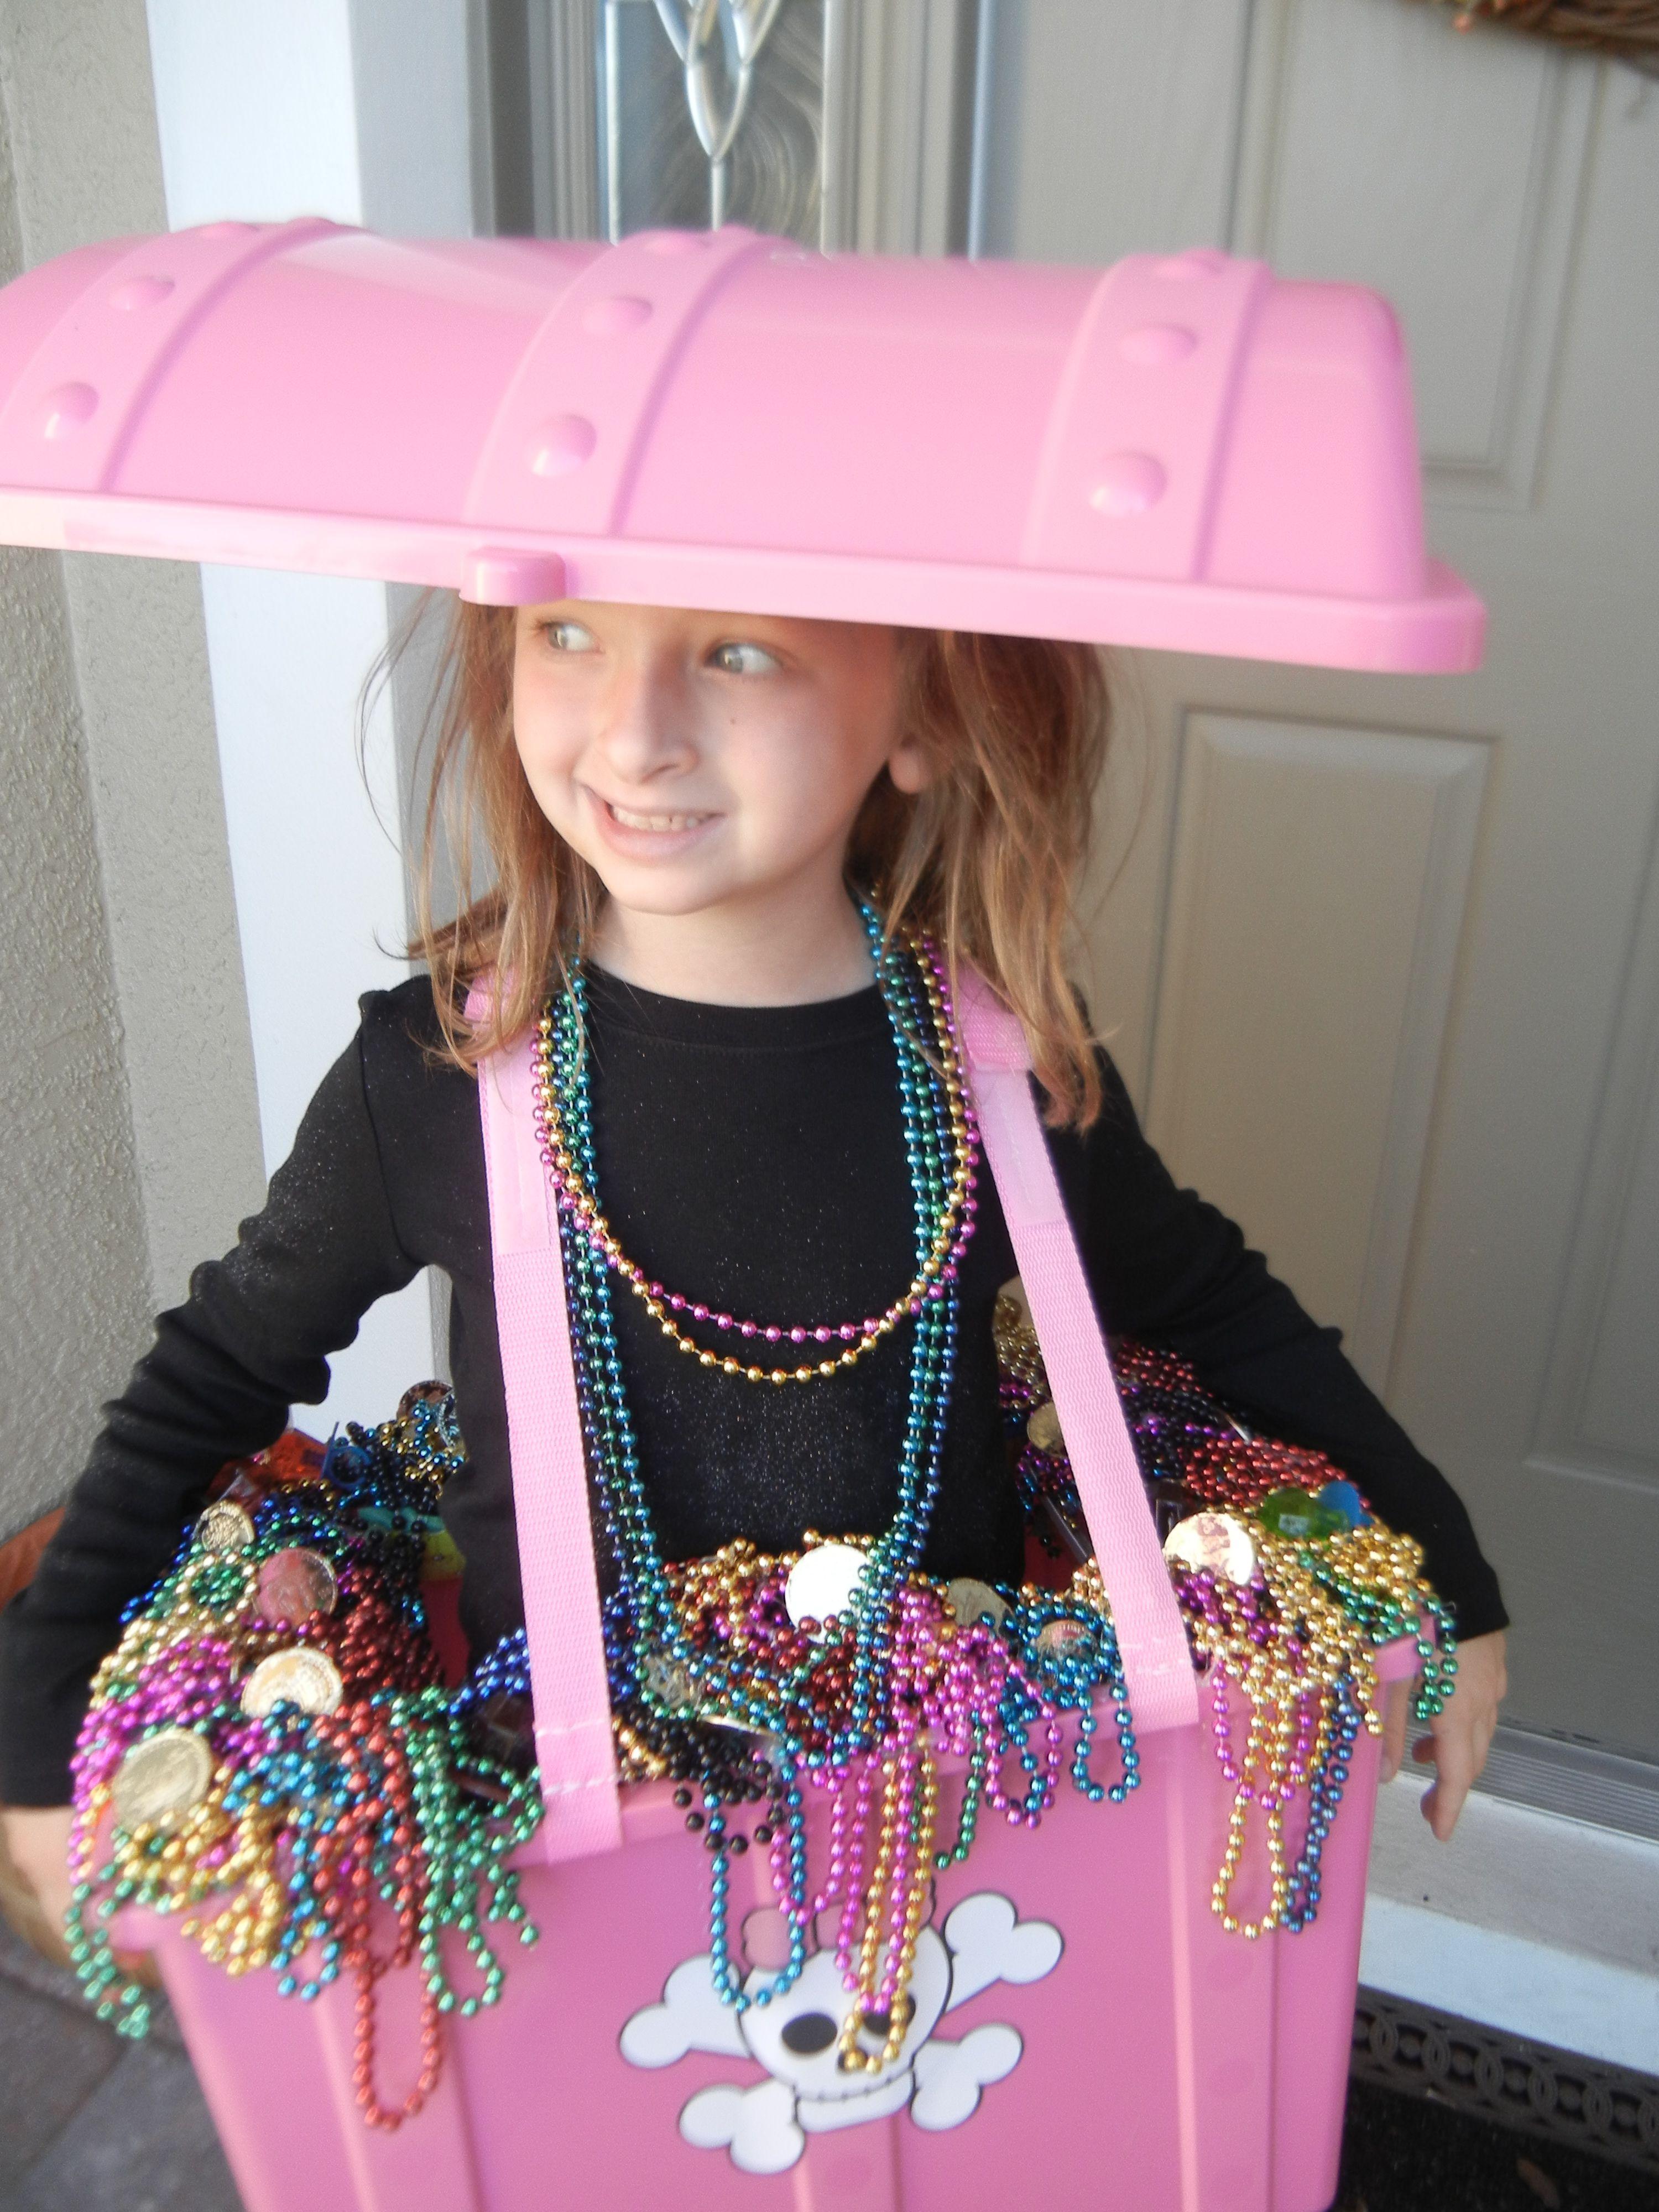 Human treasure chest (Halloween costume)   WOW! Factory Creations ...